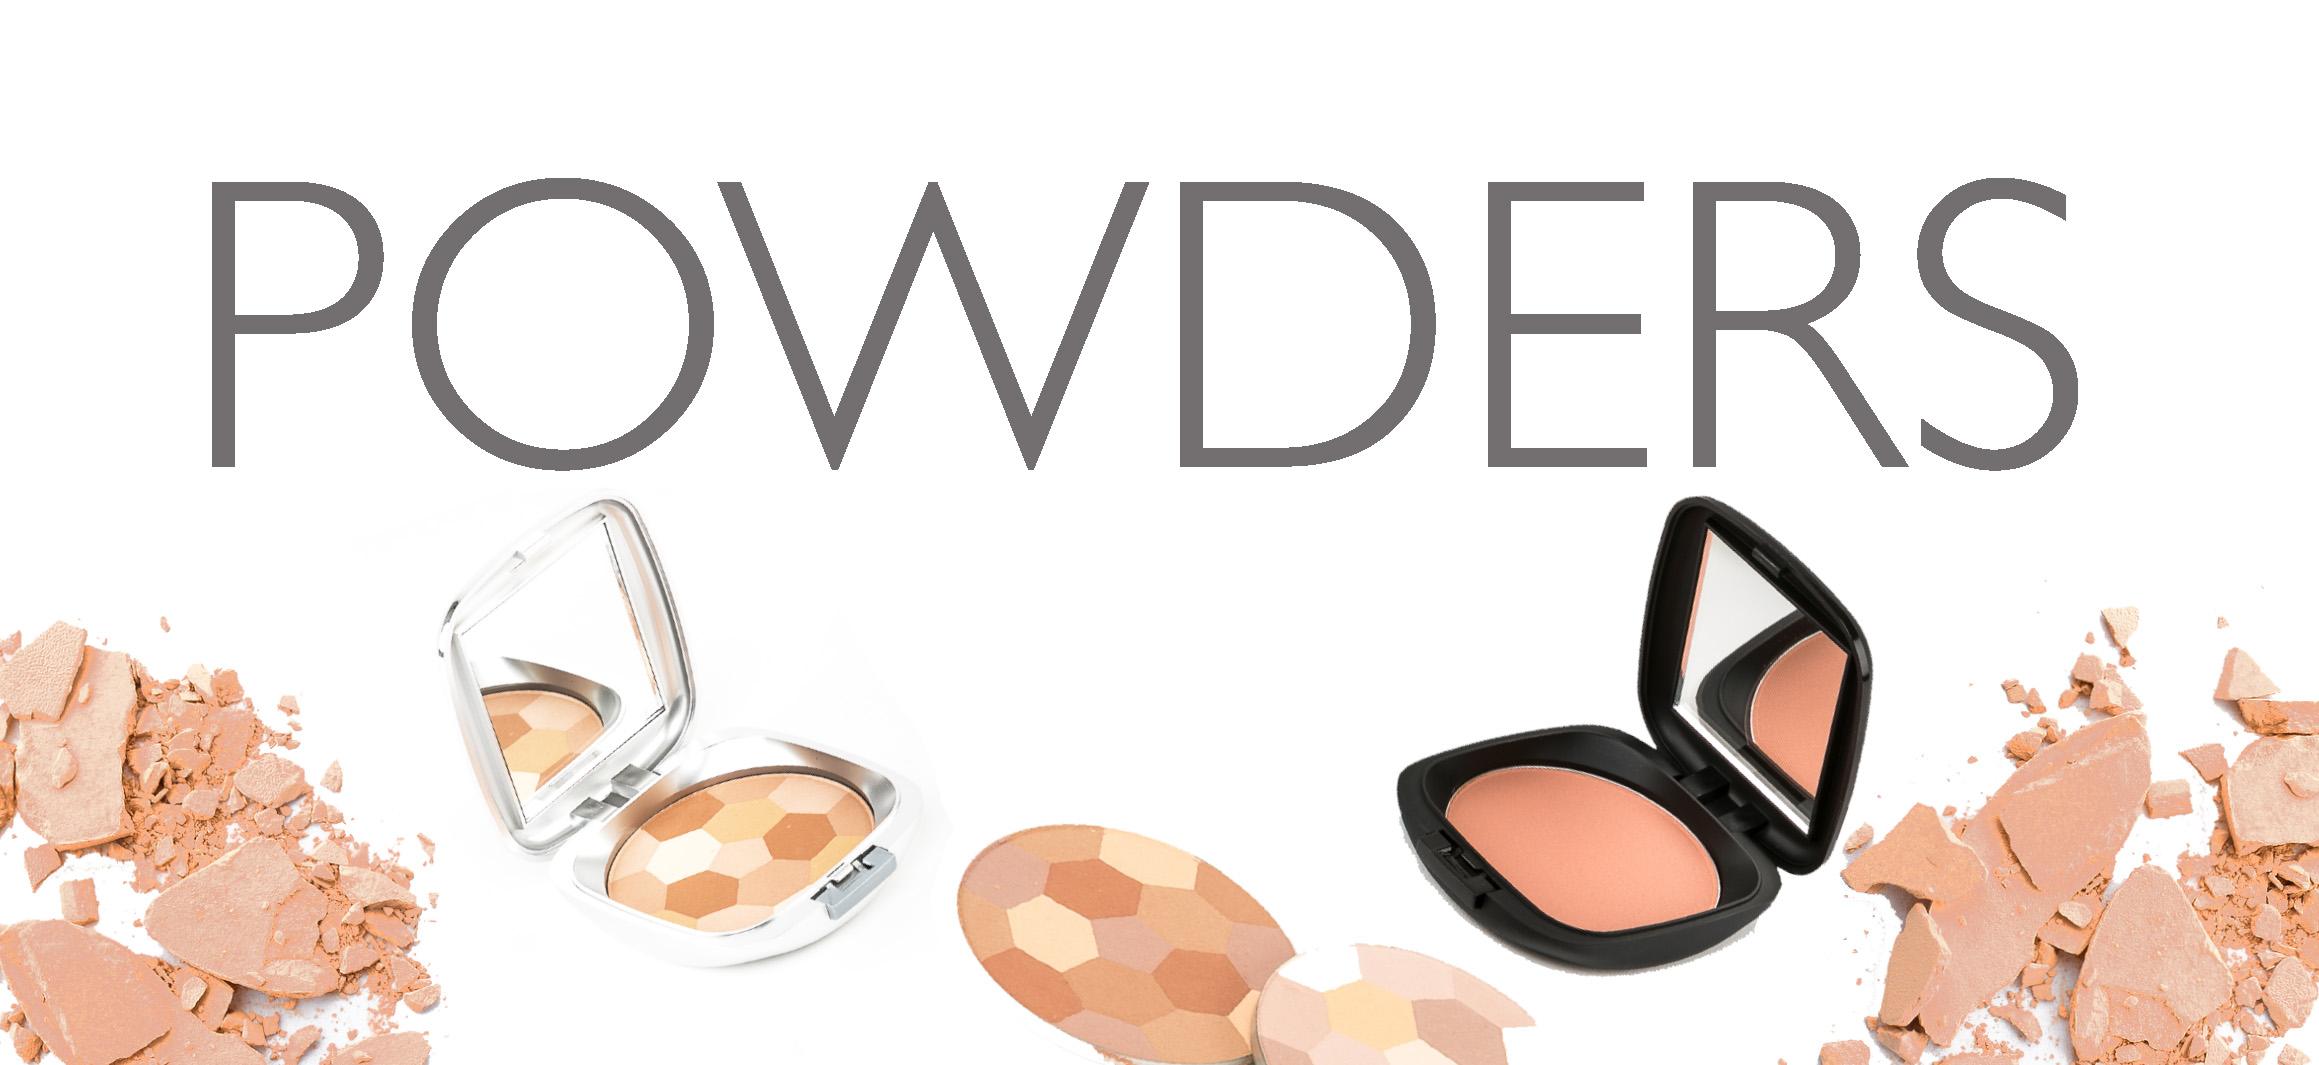 Powders.jpg